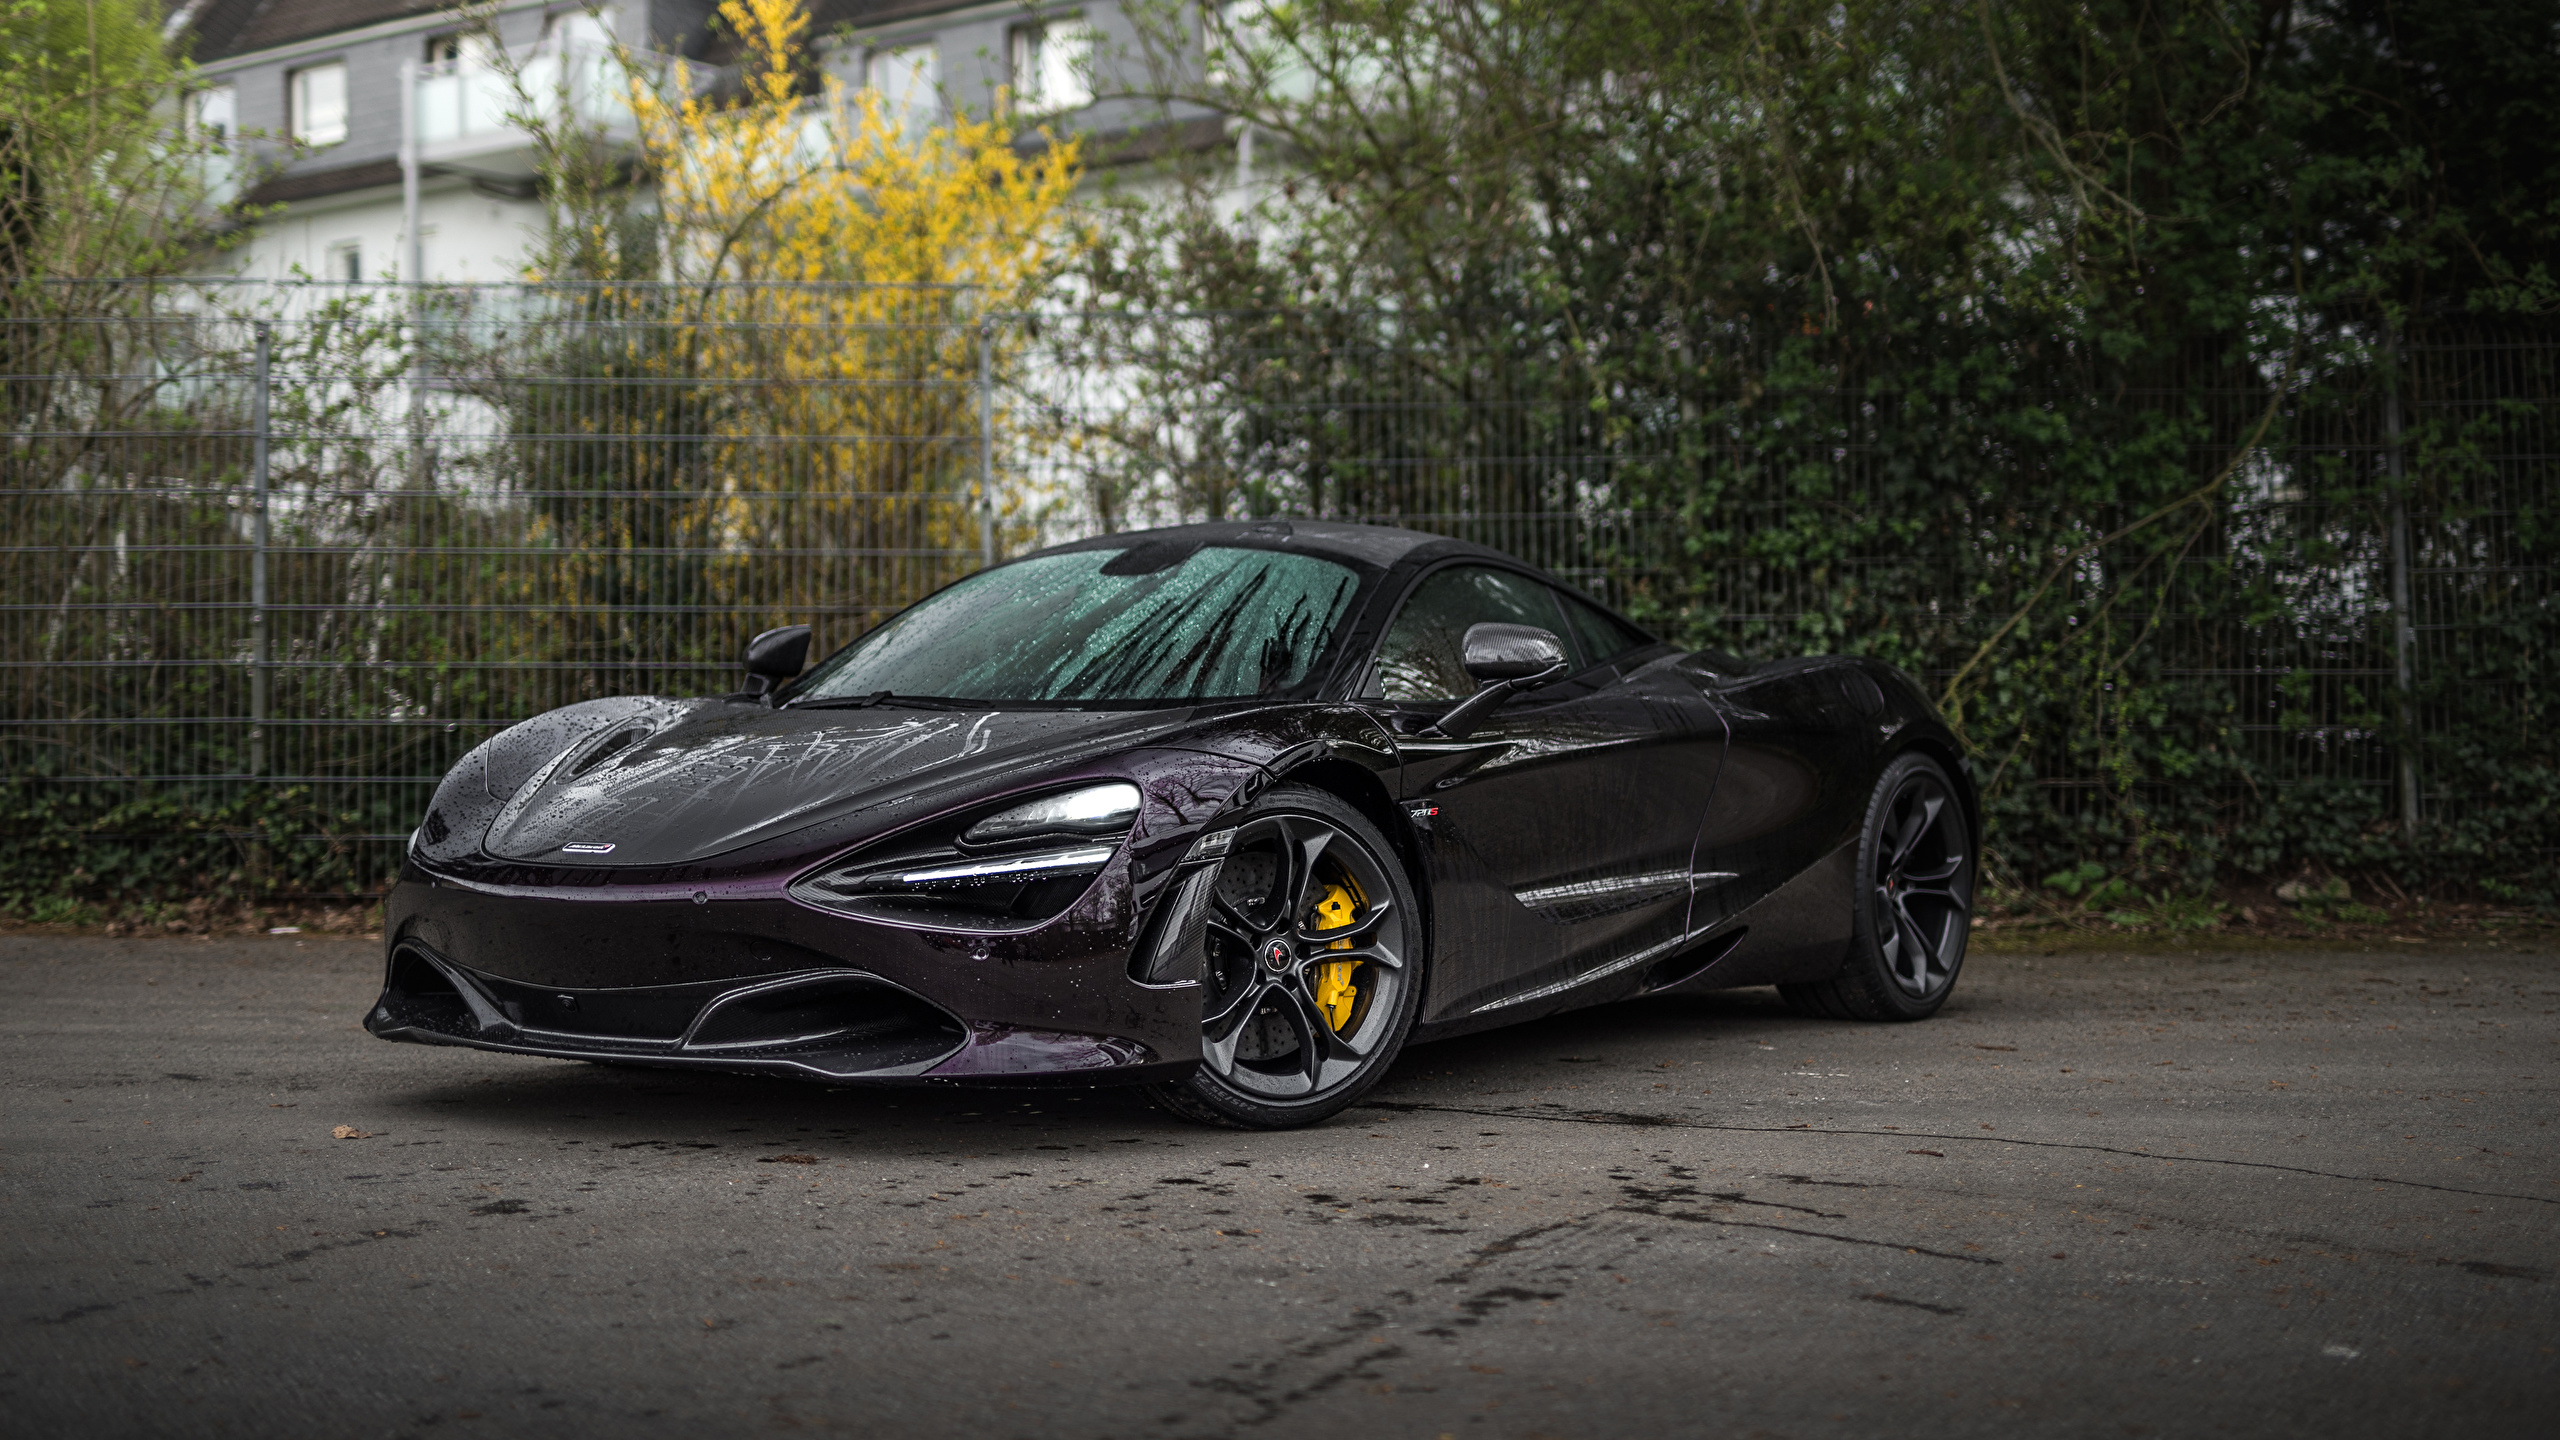 Image 2018 20 Manhart Mclaren 720s Black Cars Metallic 2560x1440